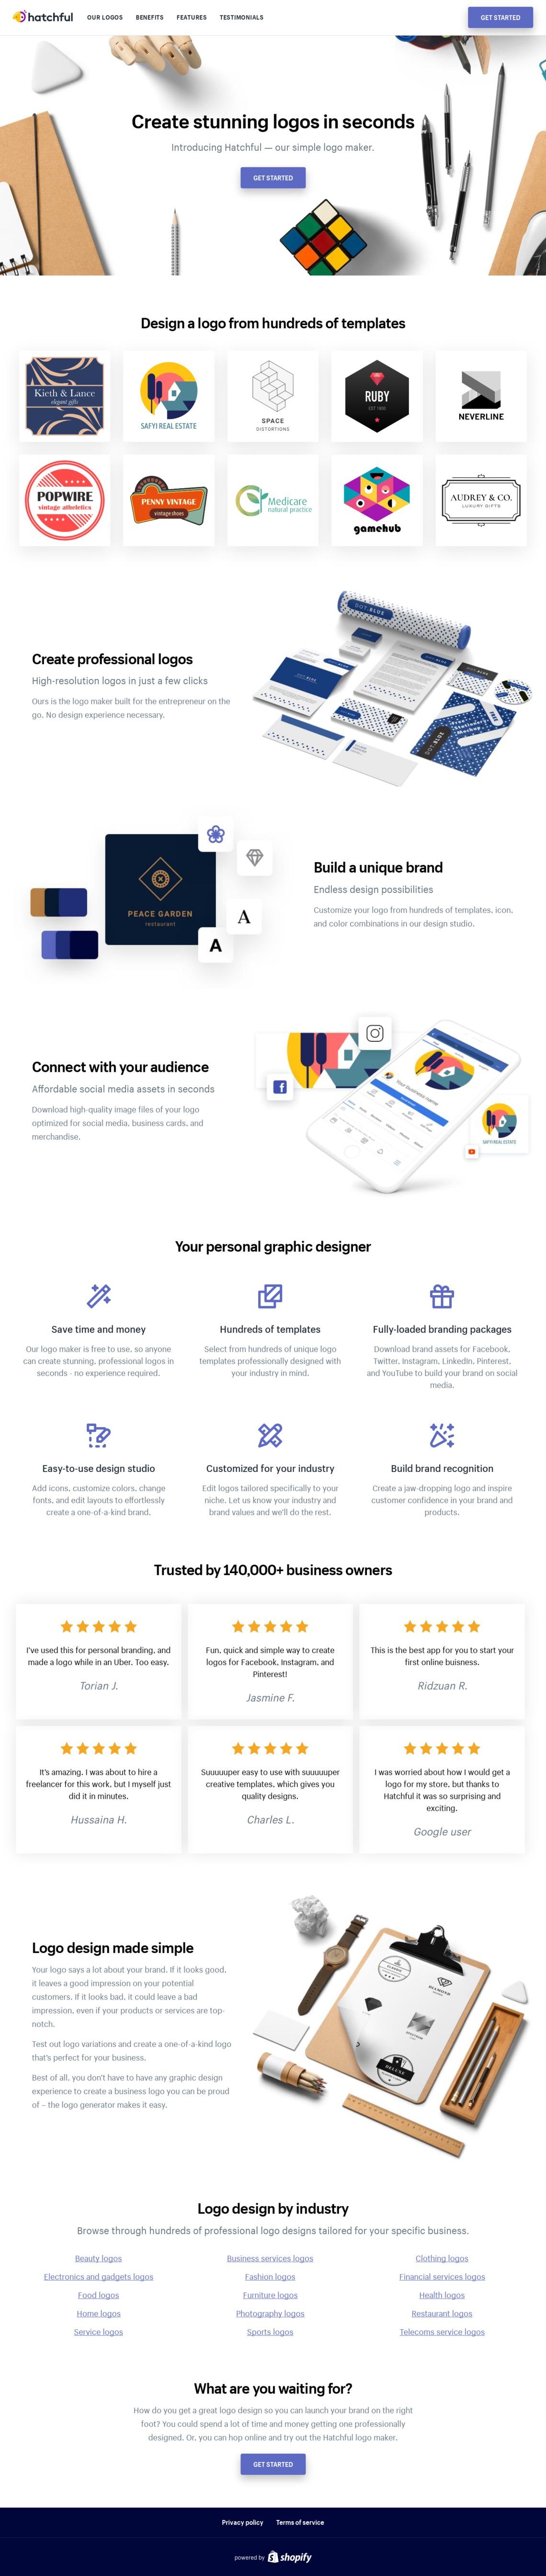 Logo Maker | Land-book - the finest hand-picked website